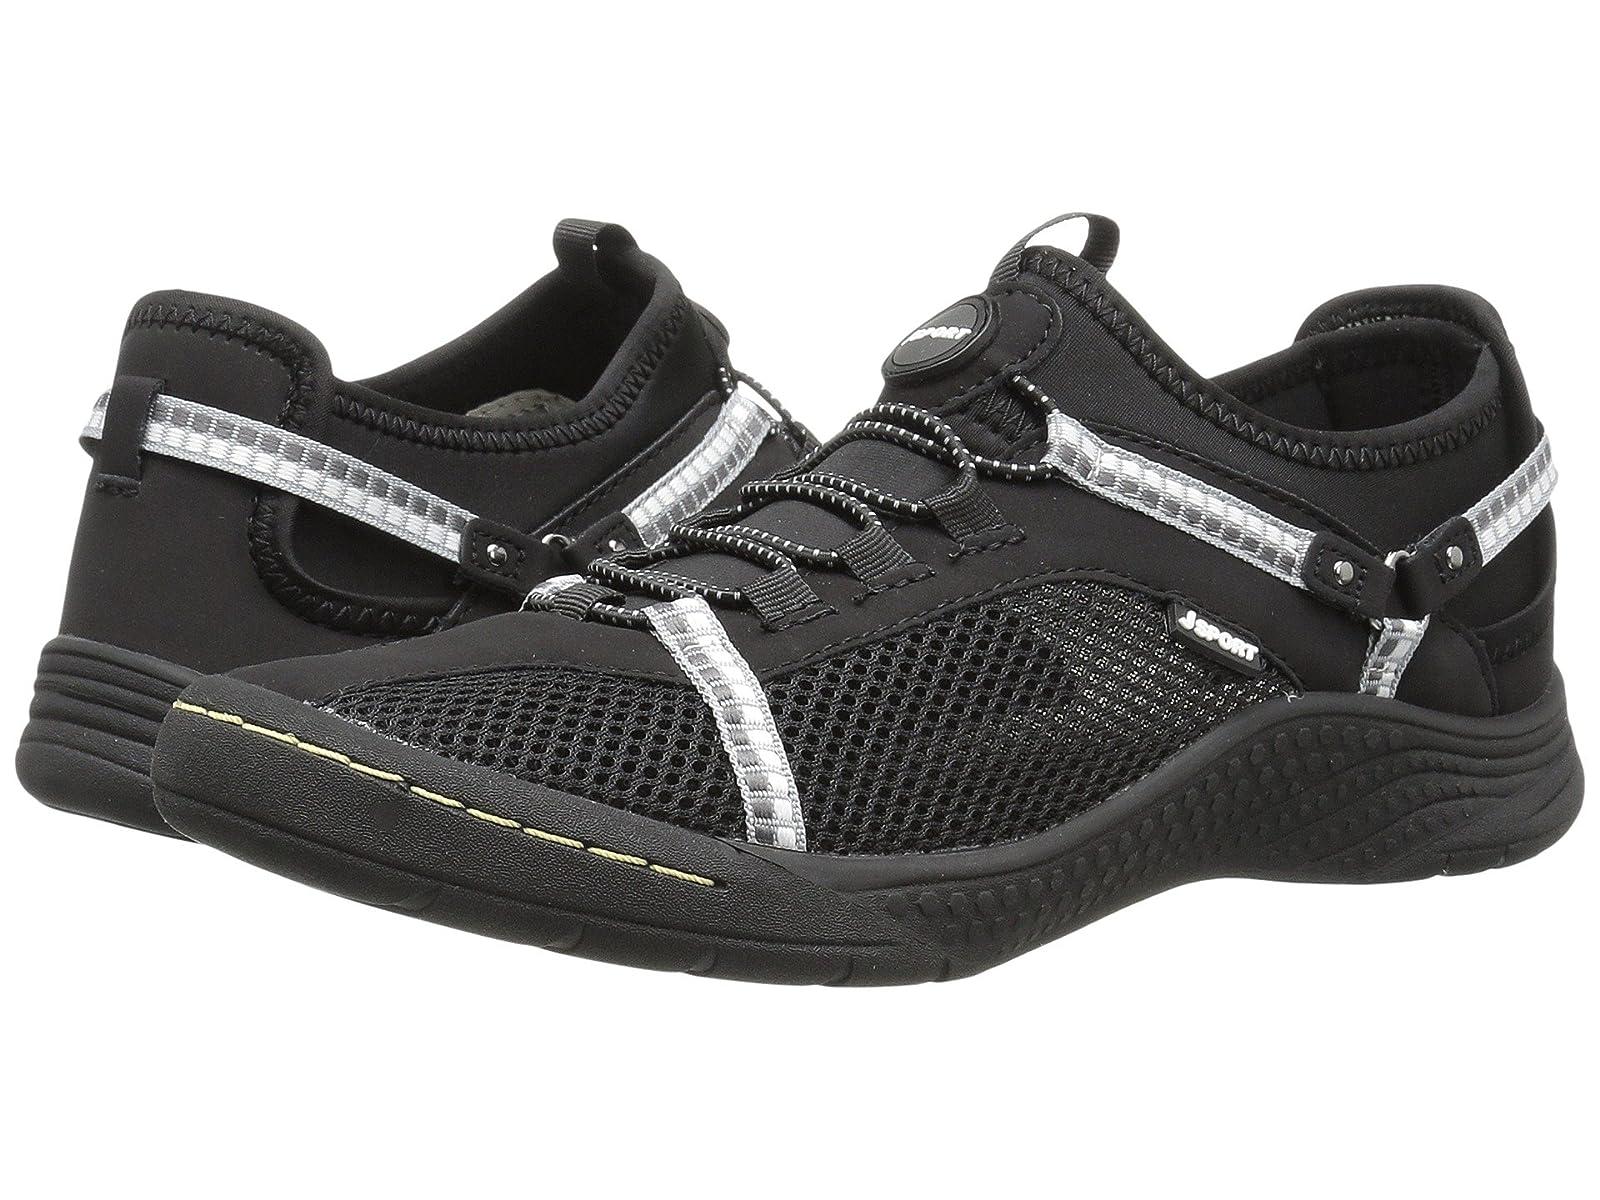 JBU Tahoe EncoreAtmospheric grades have affordable shoes